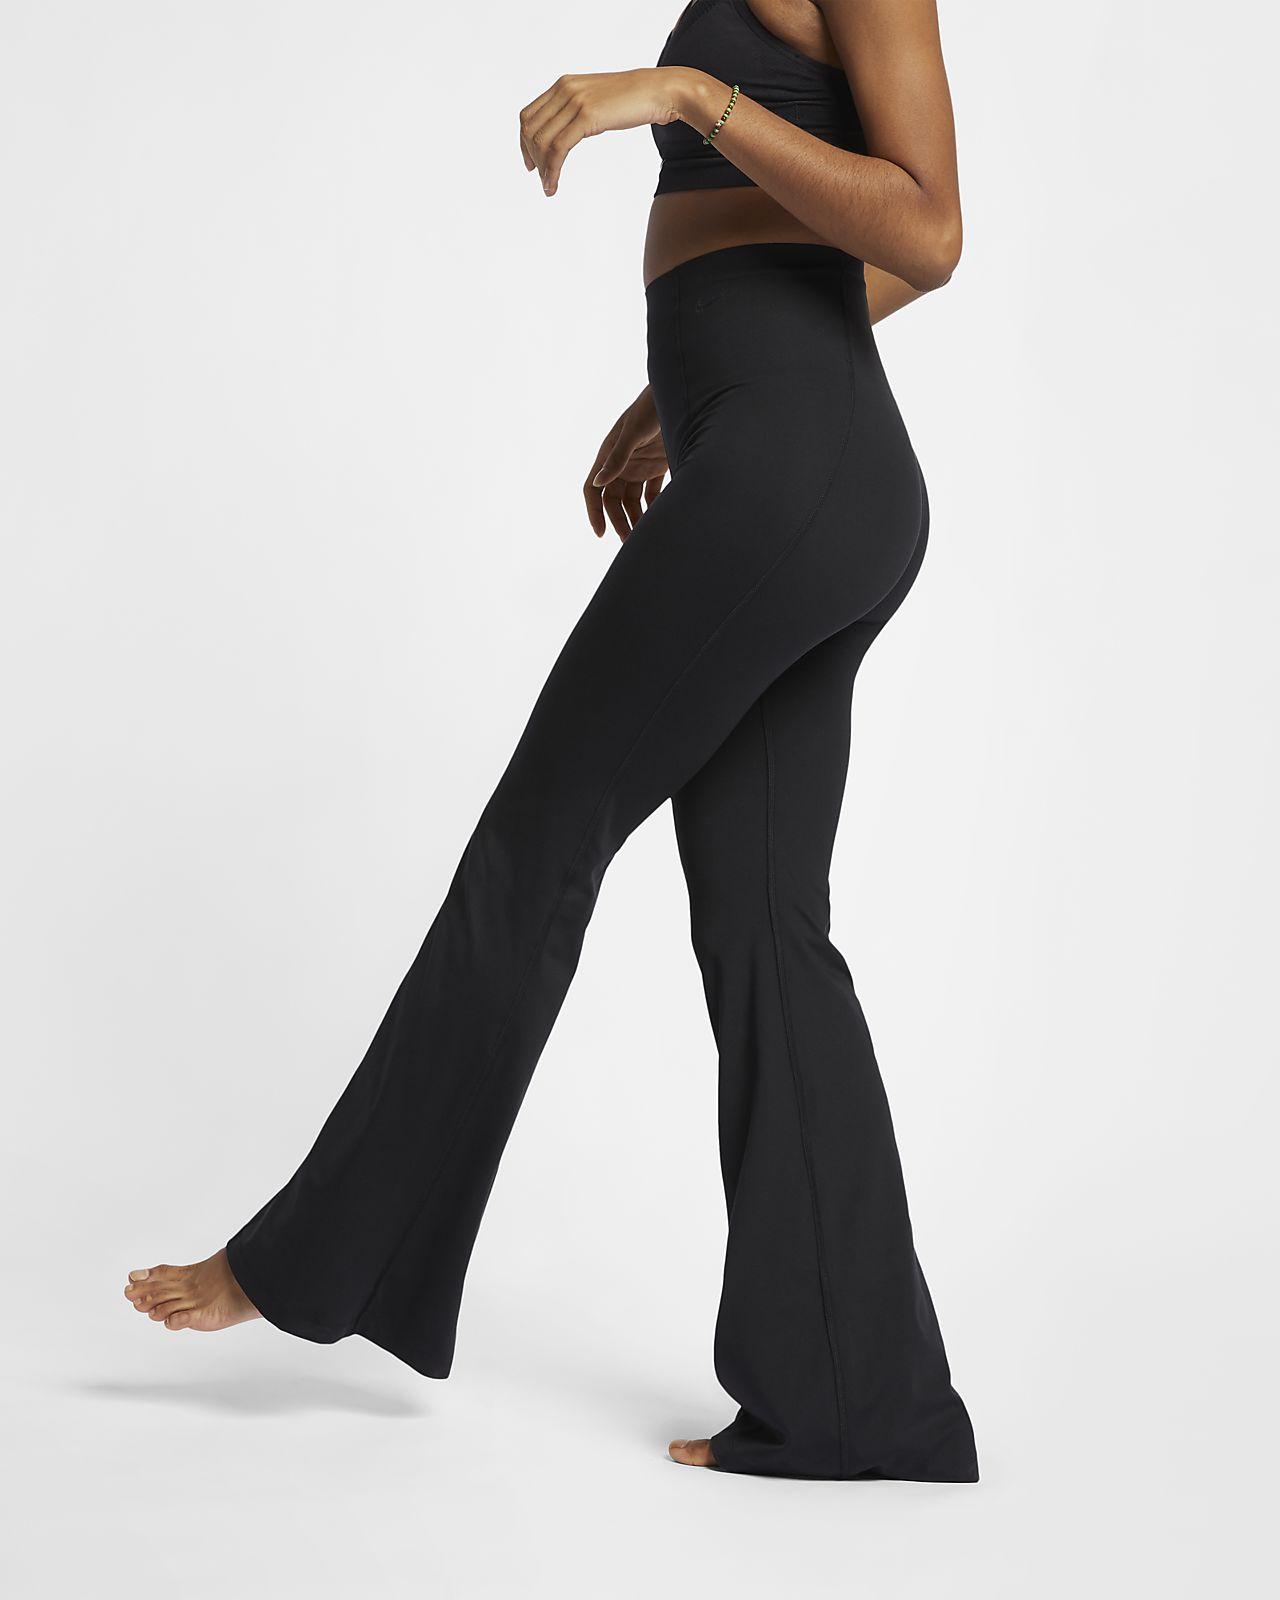 70083eb28cfad Nike Power Studio Lux Women's Yoga Tights. Nike.com